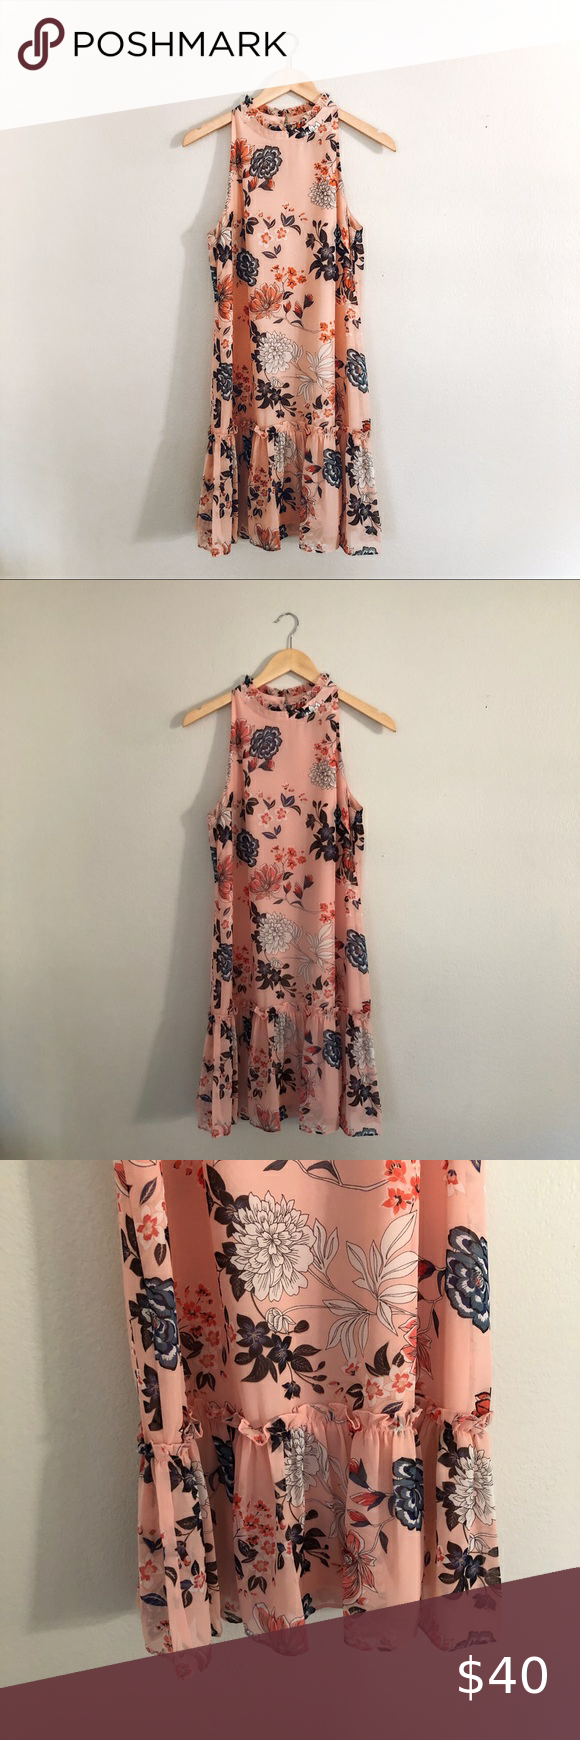 Vince Camuto Pink Floral Dress Lace Blue Dress Pink Floral Dress Floral Blue Dress [ 1740 x 580 Pixel ]